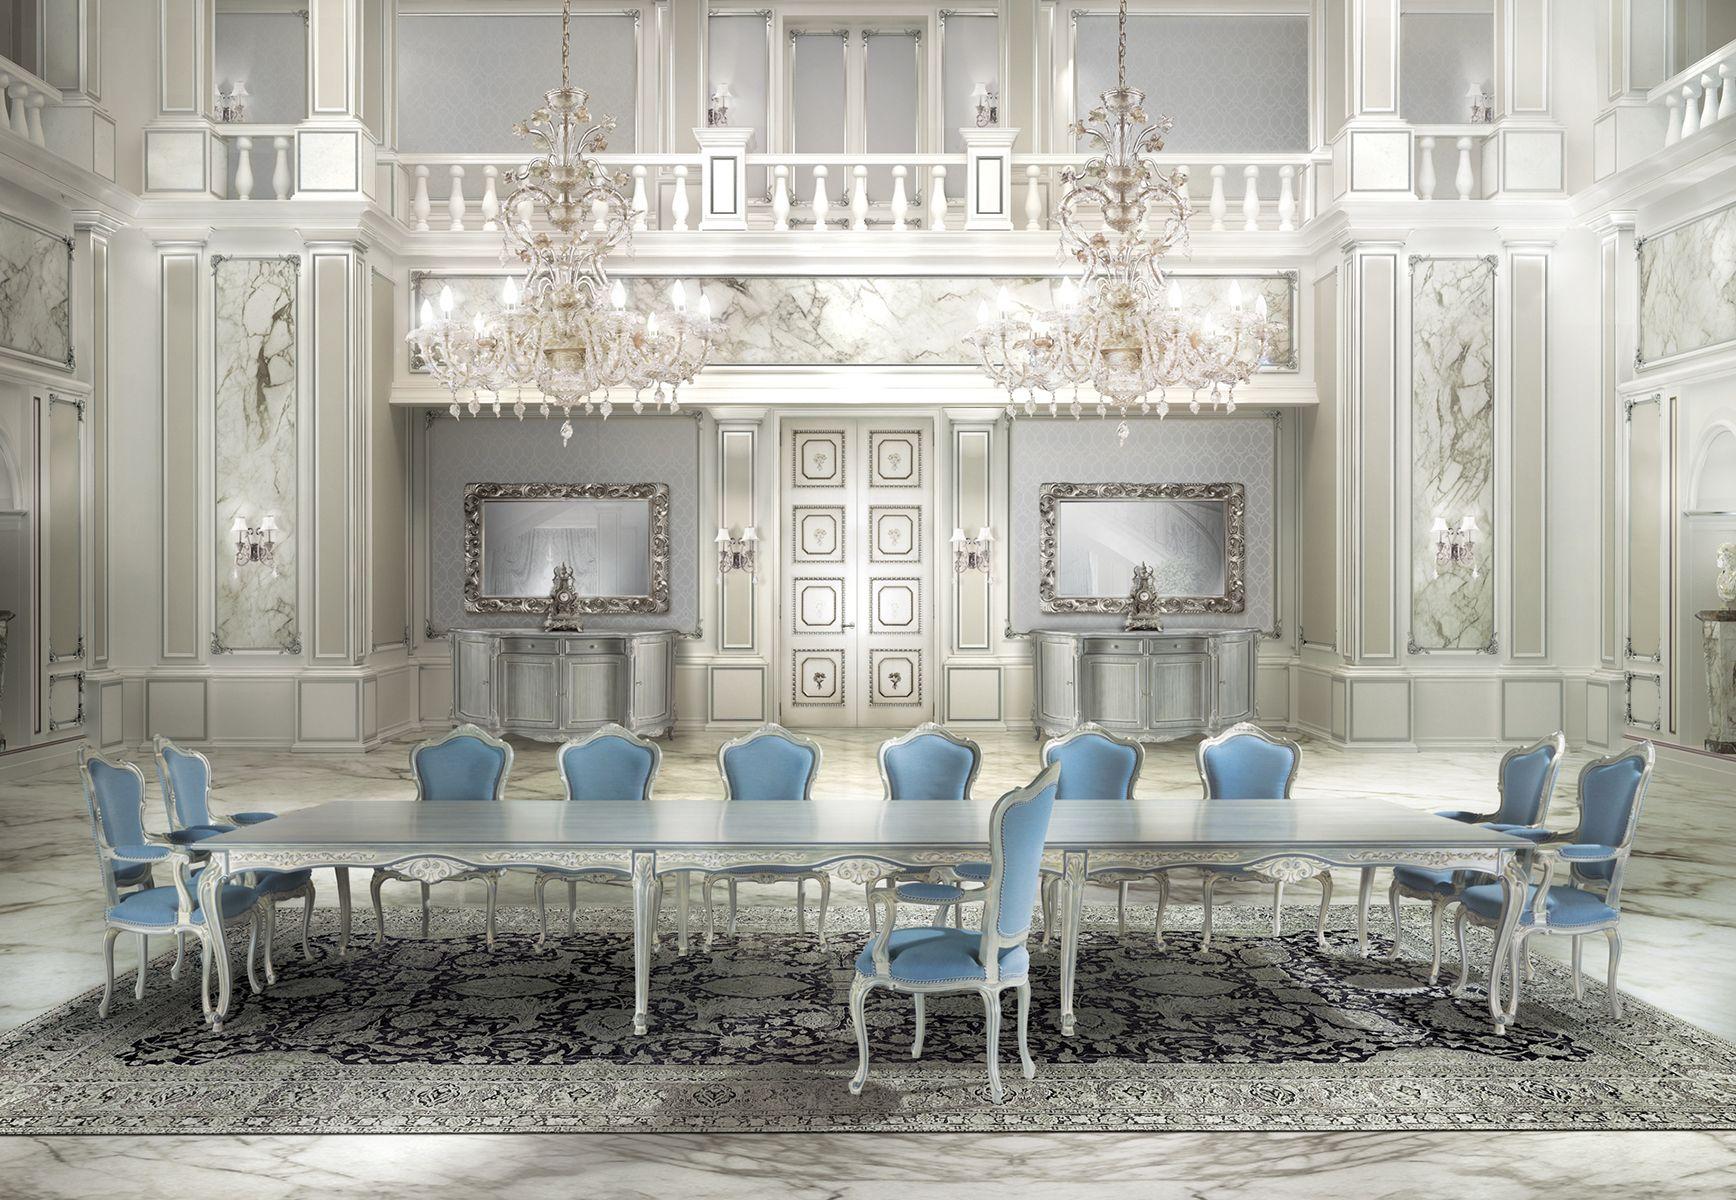 RODI Luxury dining room collection | ANGELO CAPPELLINI | Pinterest ...